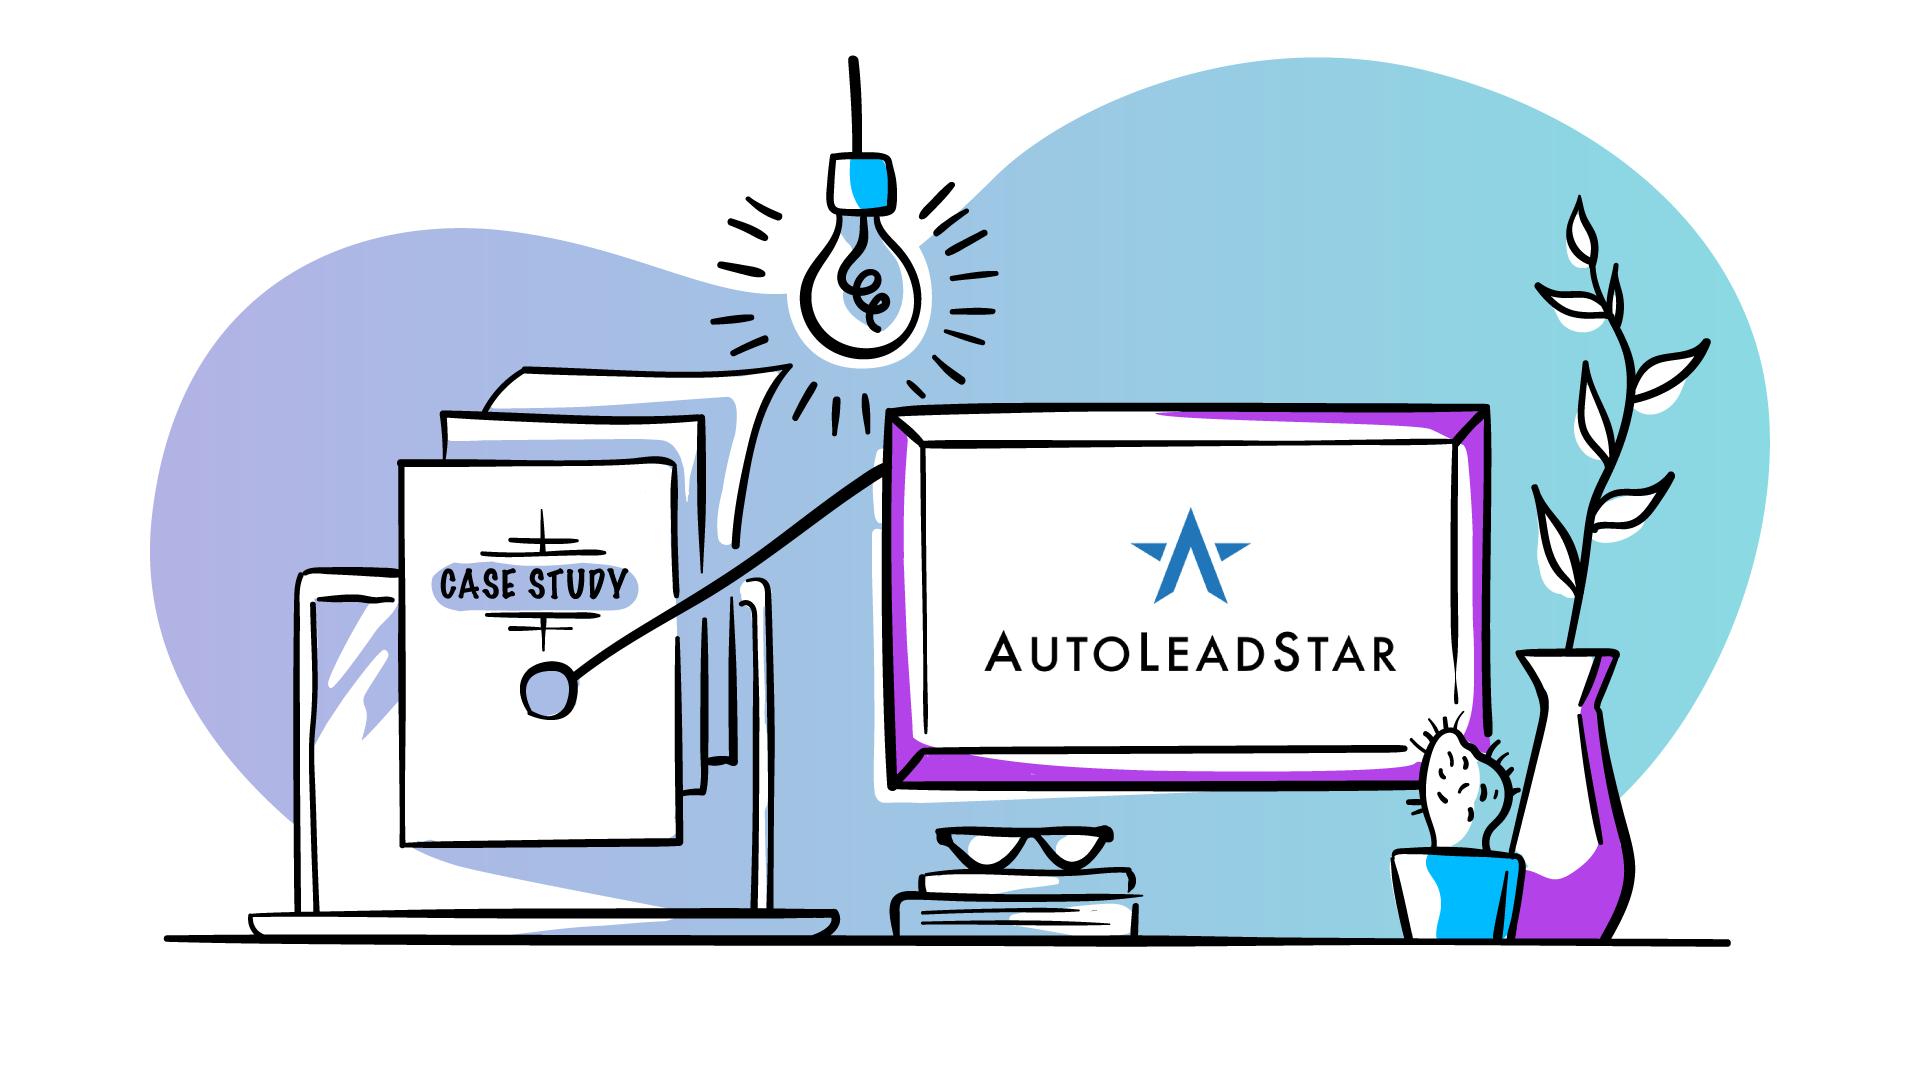 AutoLeadStar